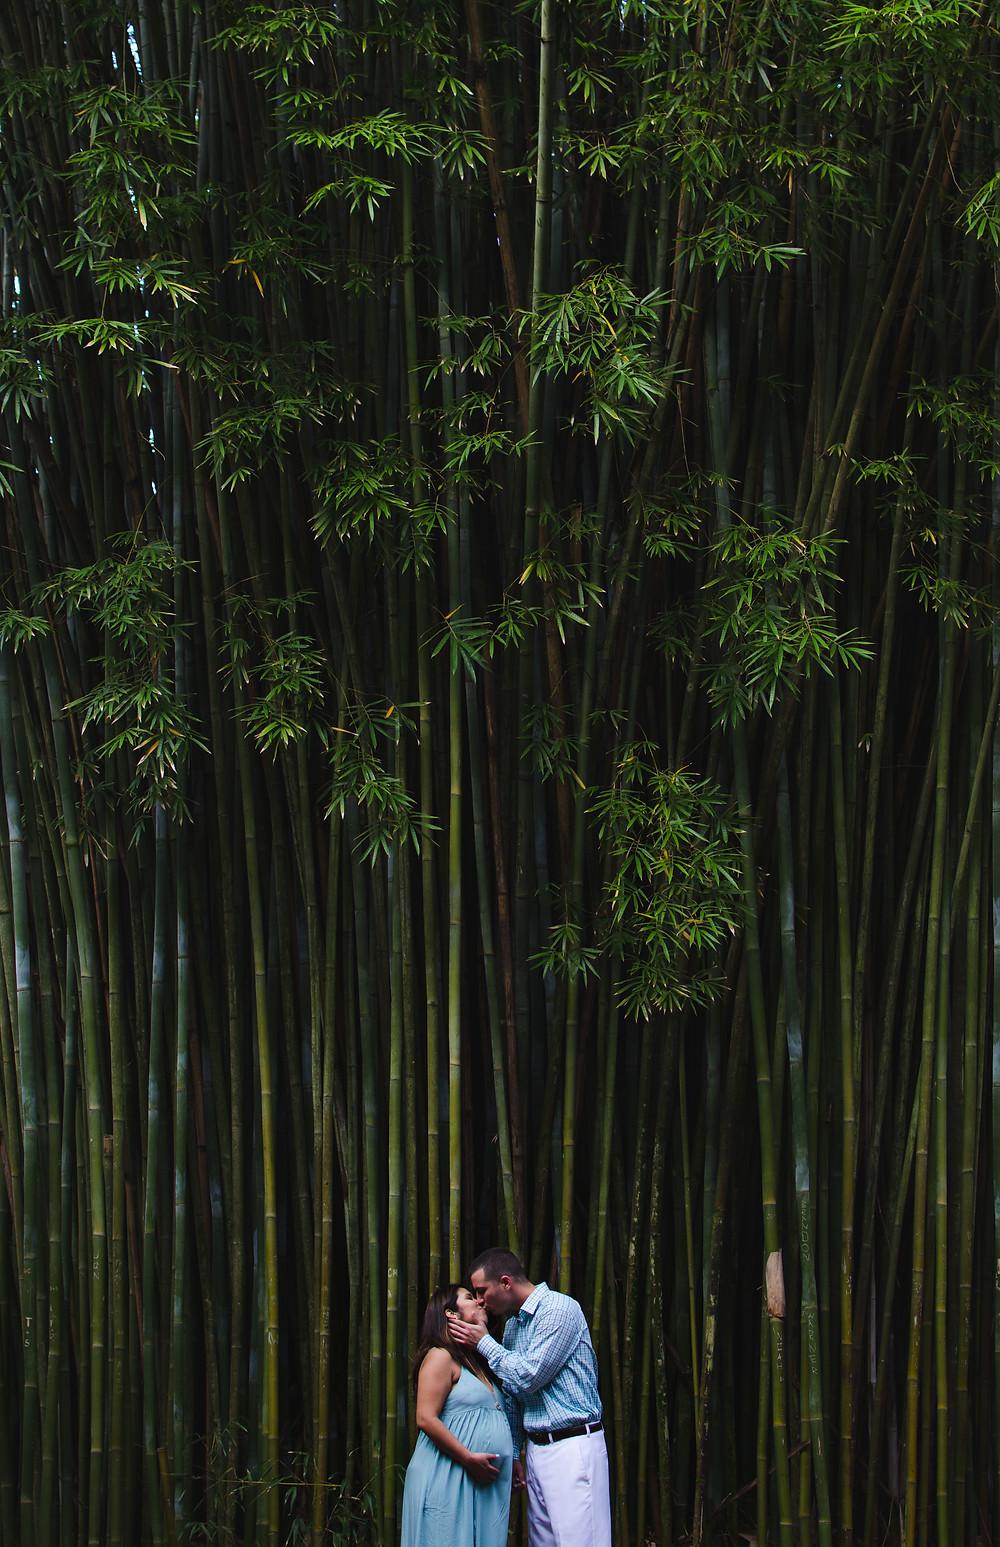 Bamboo Garden Maternity